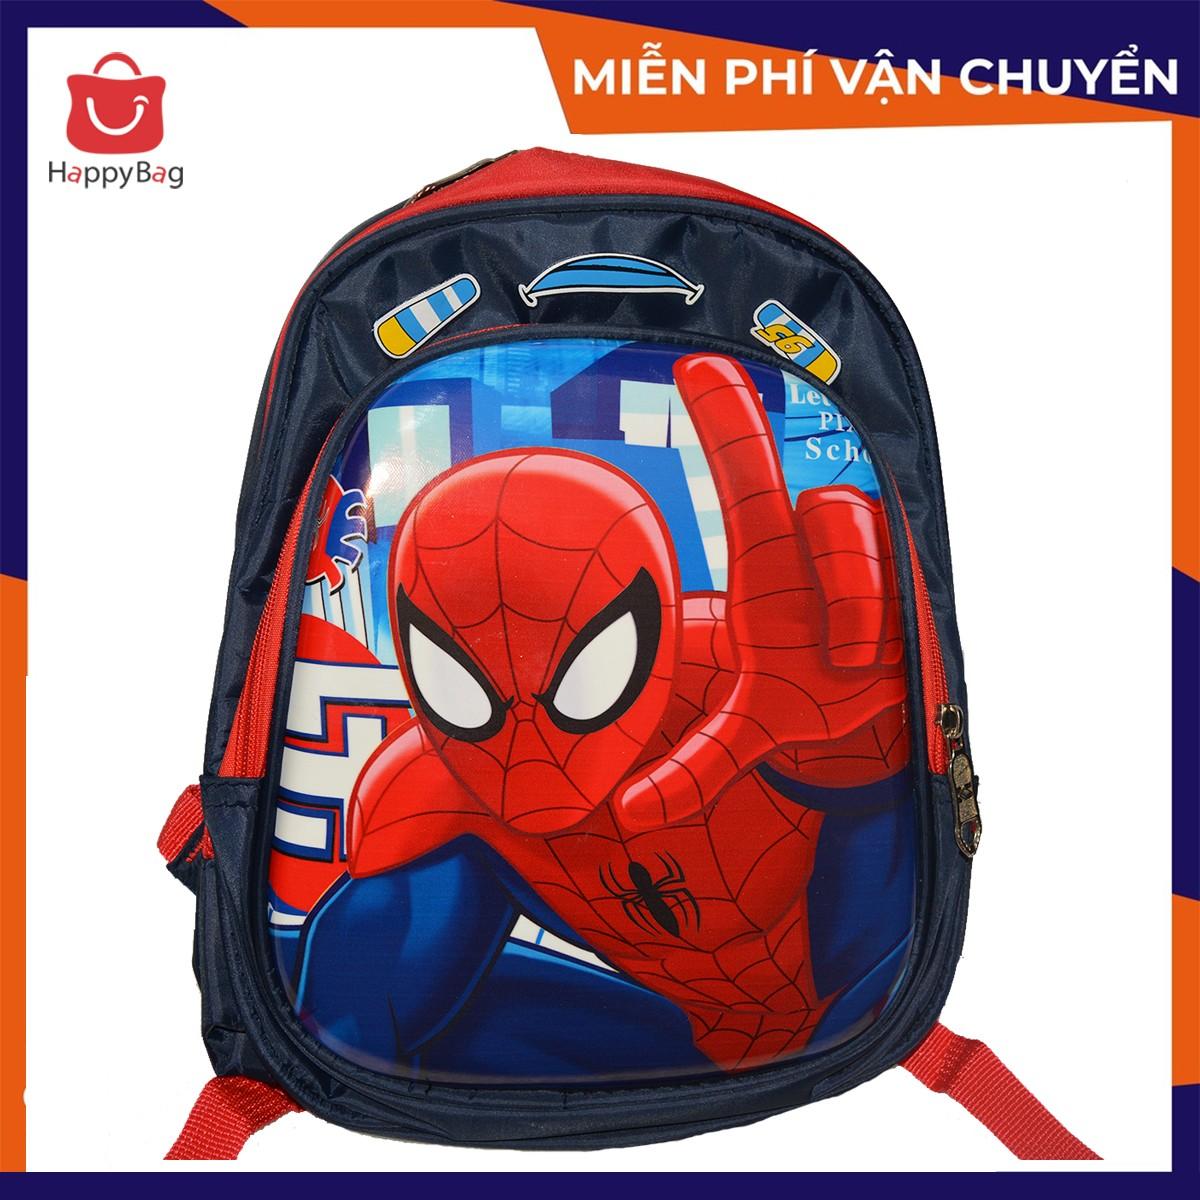 tui-deo-cheo-nam-cong-usb-sac-dien-thoai-da-phoi-vai-polyester-cao-cap--ma-td05-1